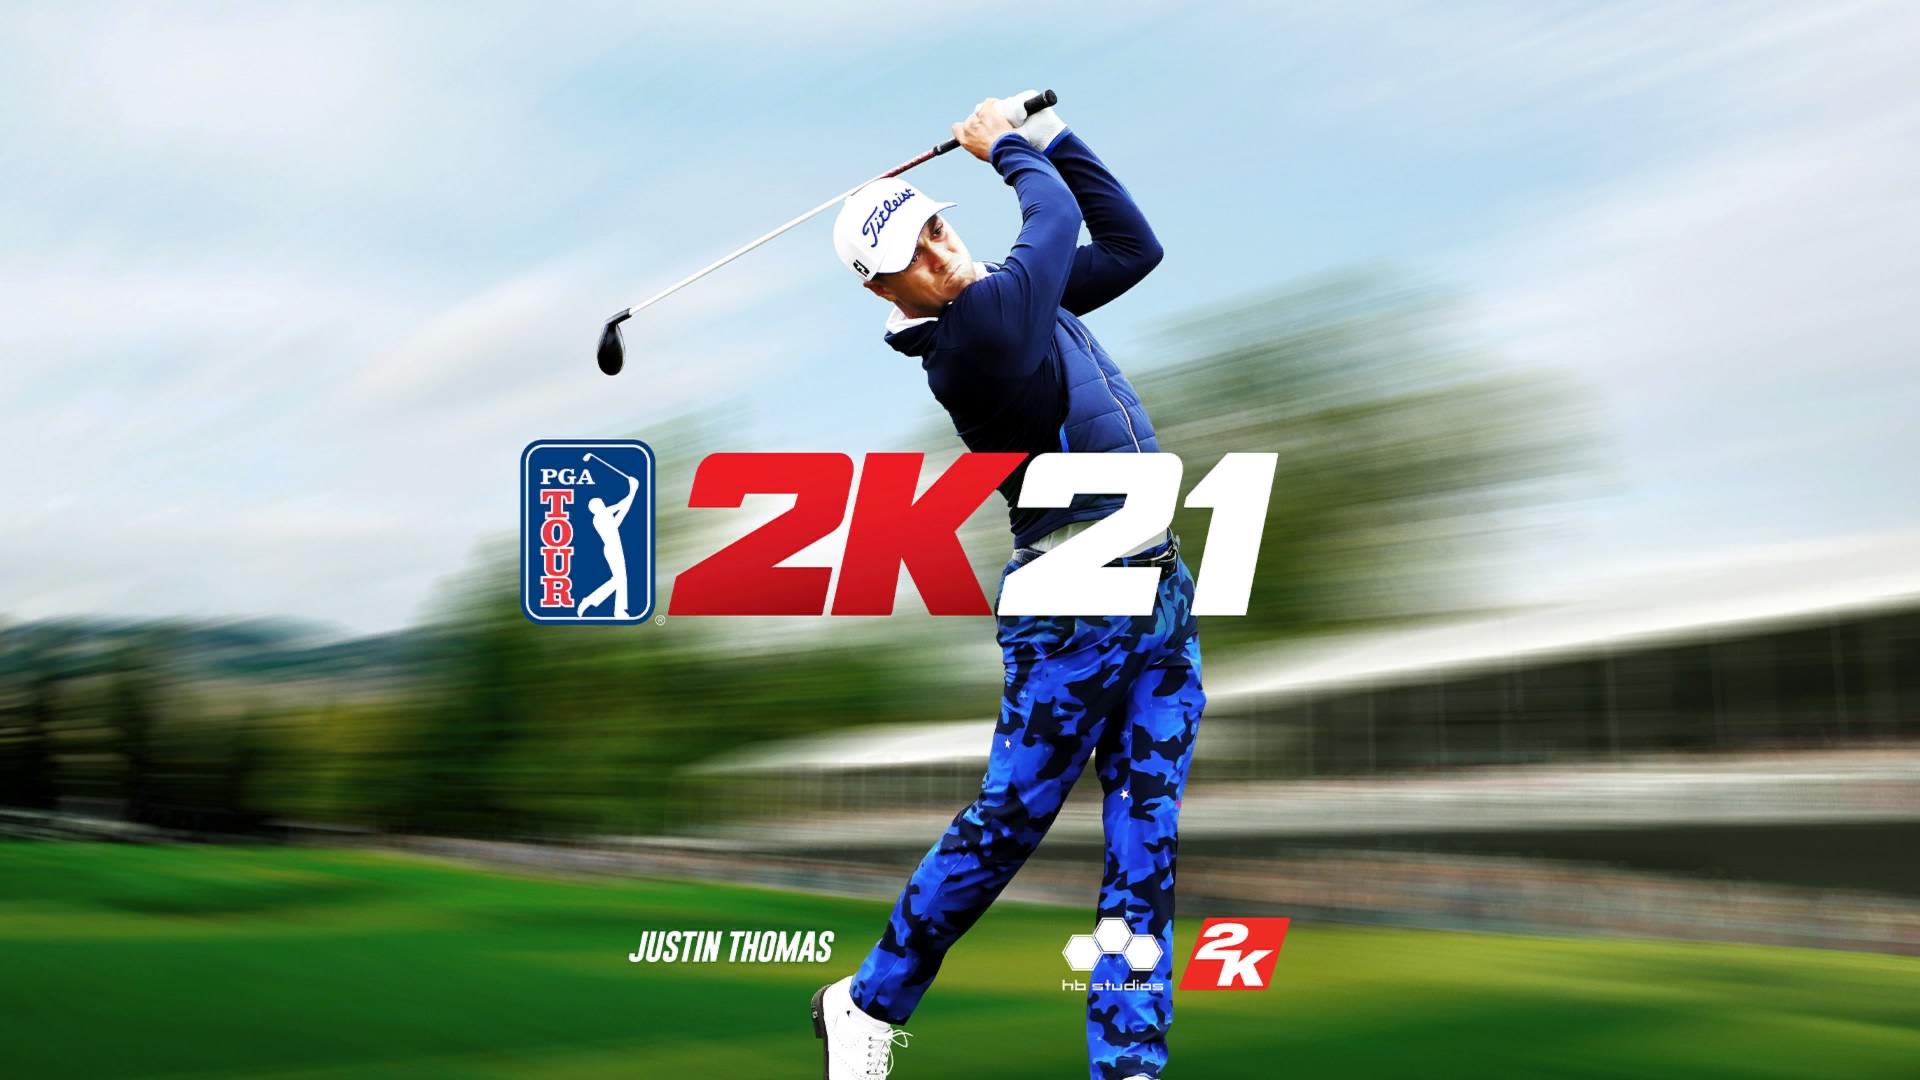 PGA Tour 2K21 title screen